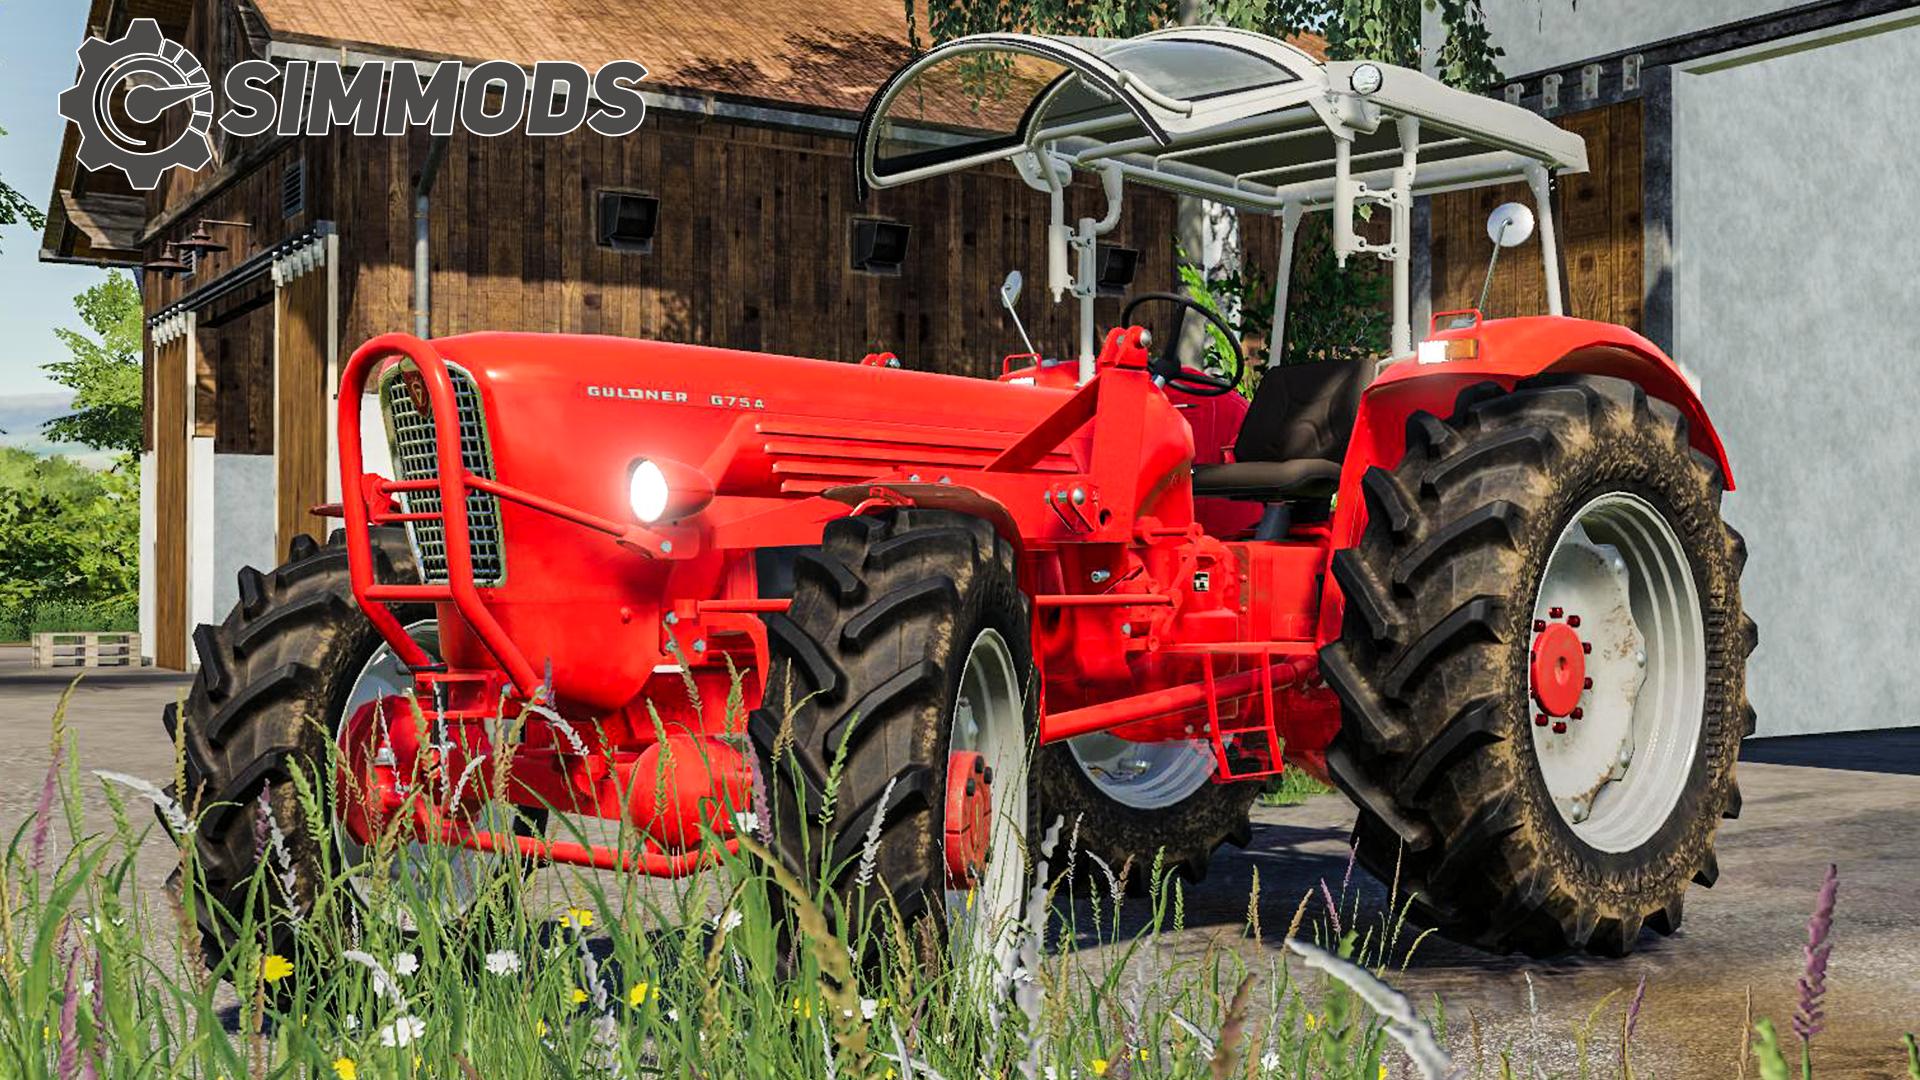 LS19: Güldner G75A Oldtimer-Traktor – DOWNLOAD